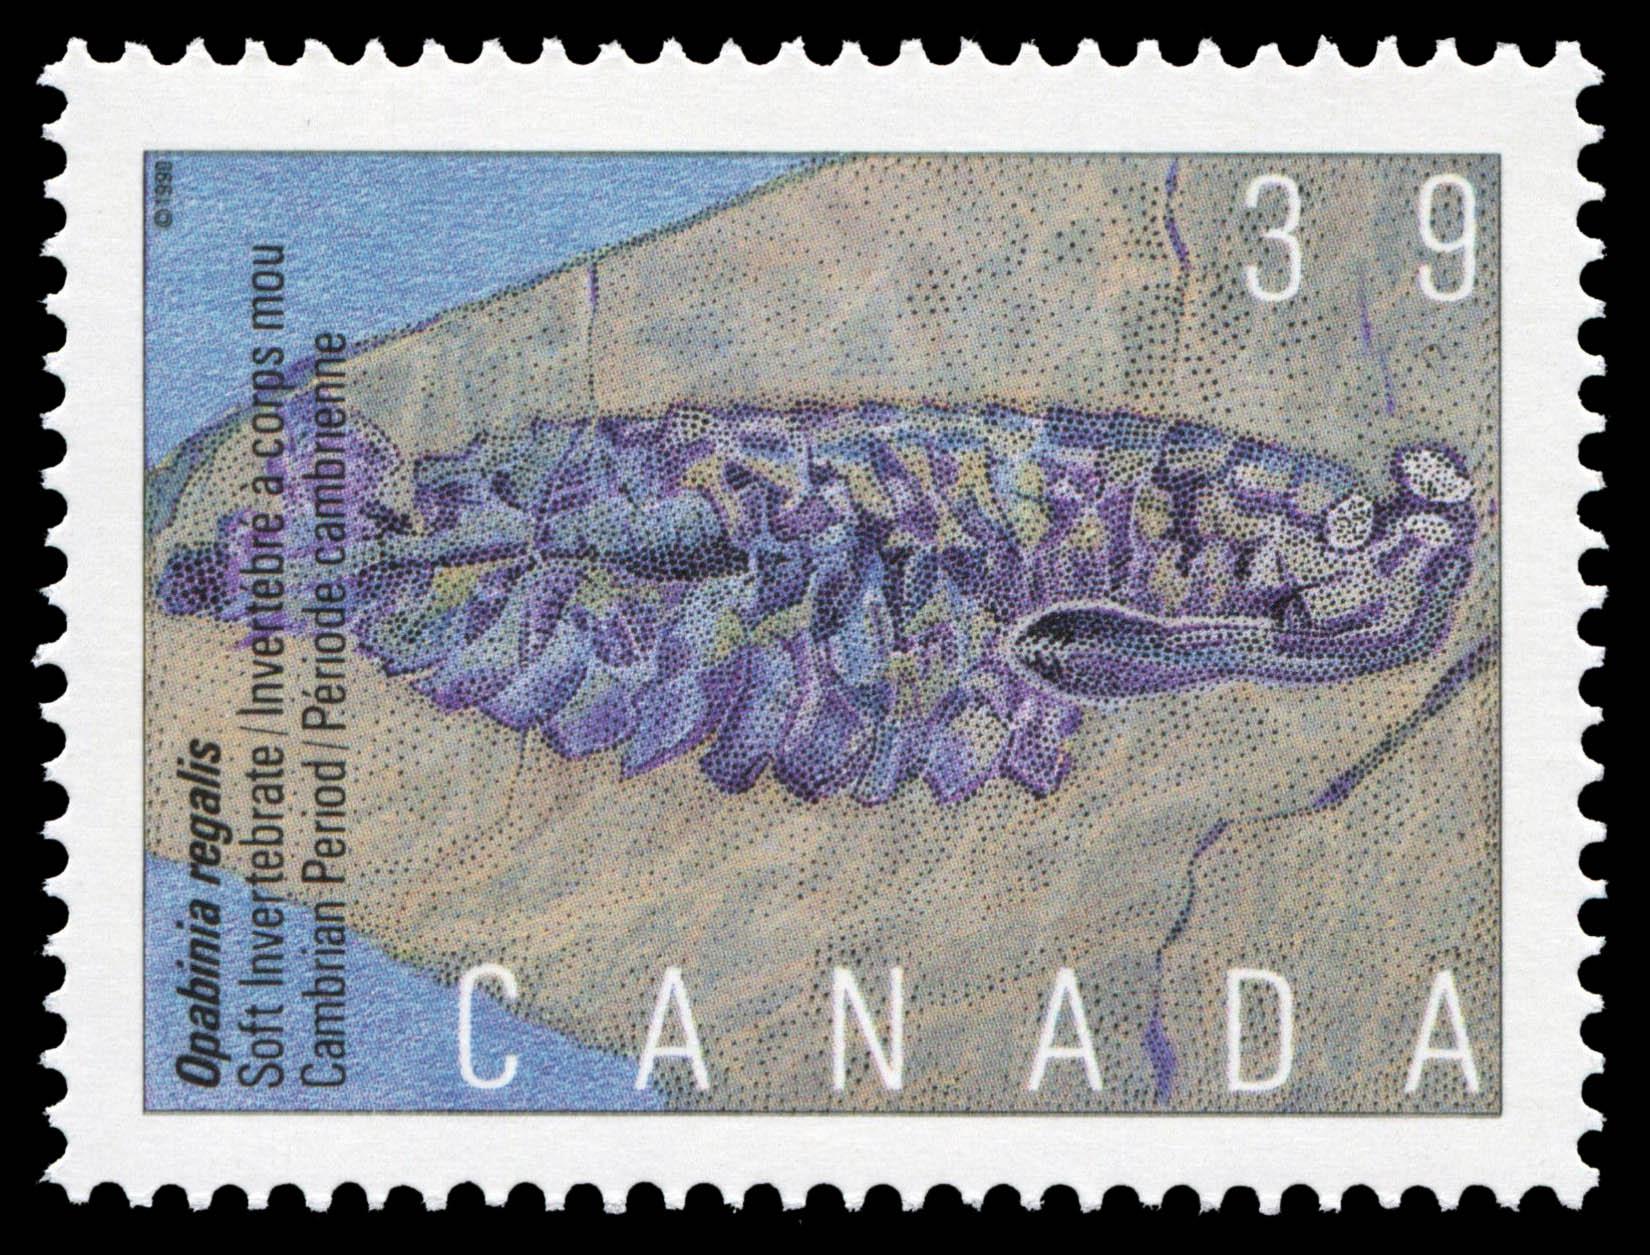 Opabinia regalis, Soft Invertebrate, Cambrian Period Canada Postage Stamp